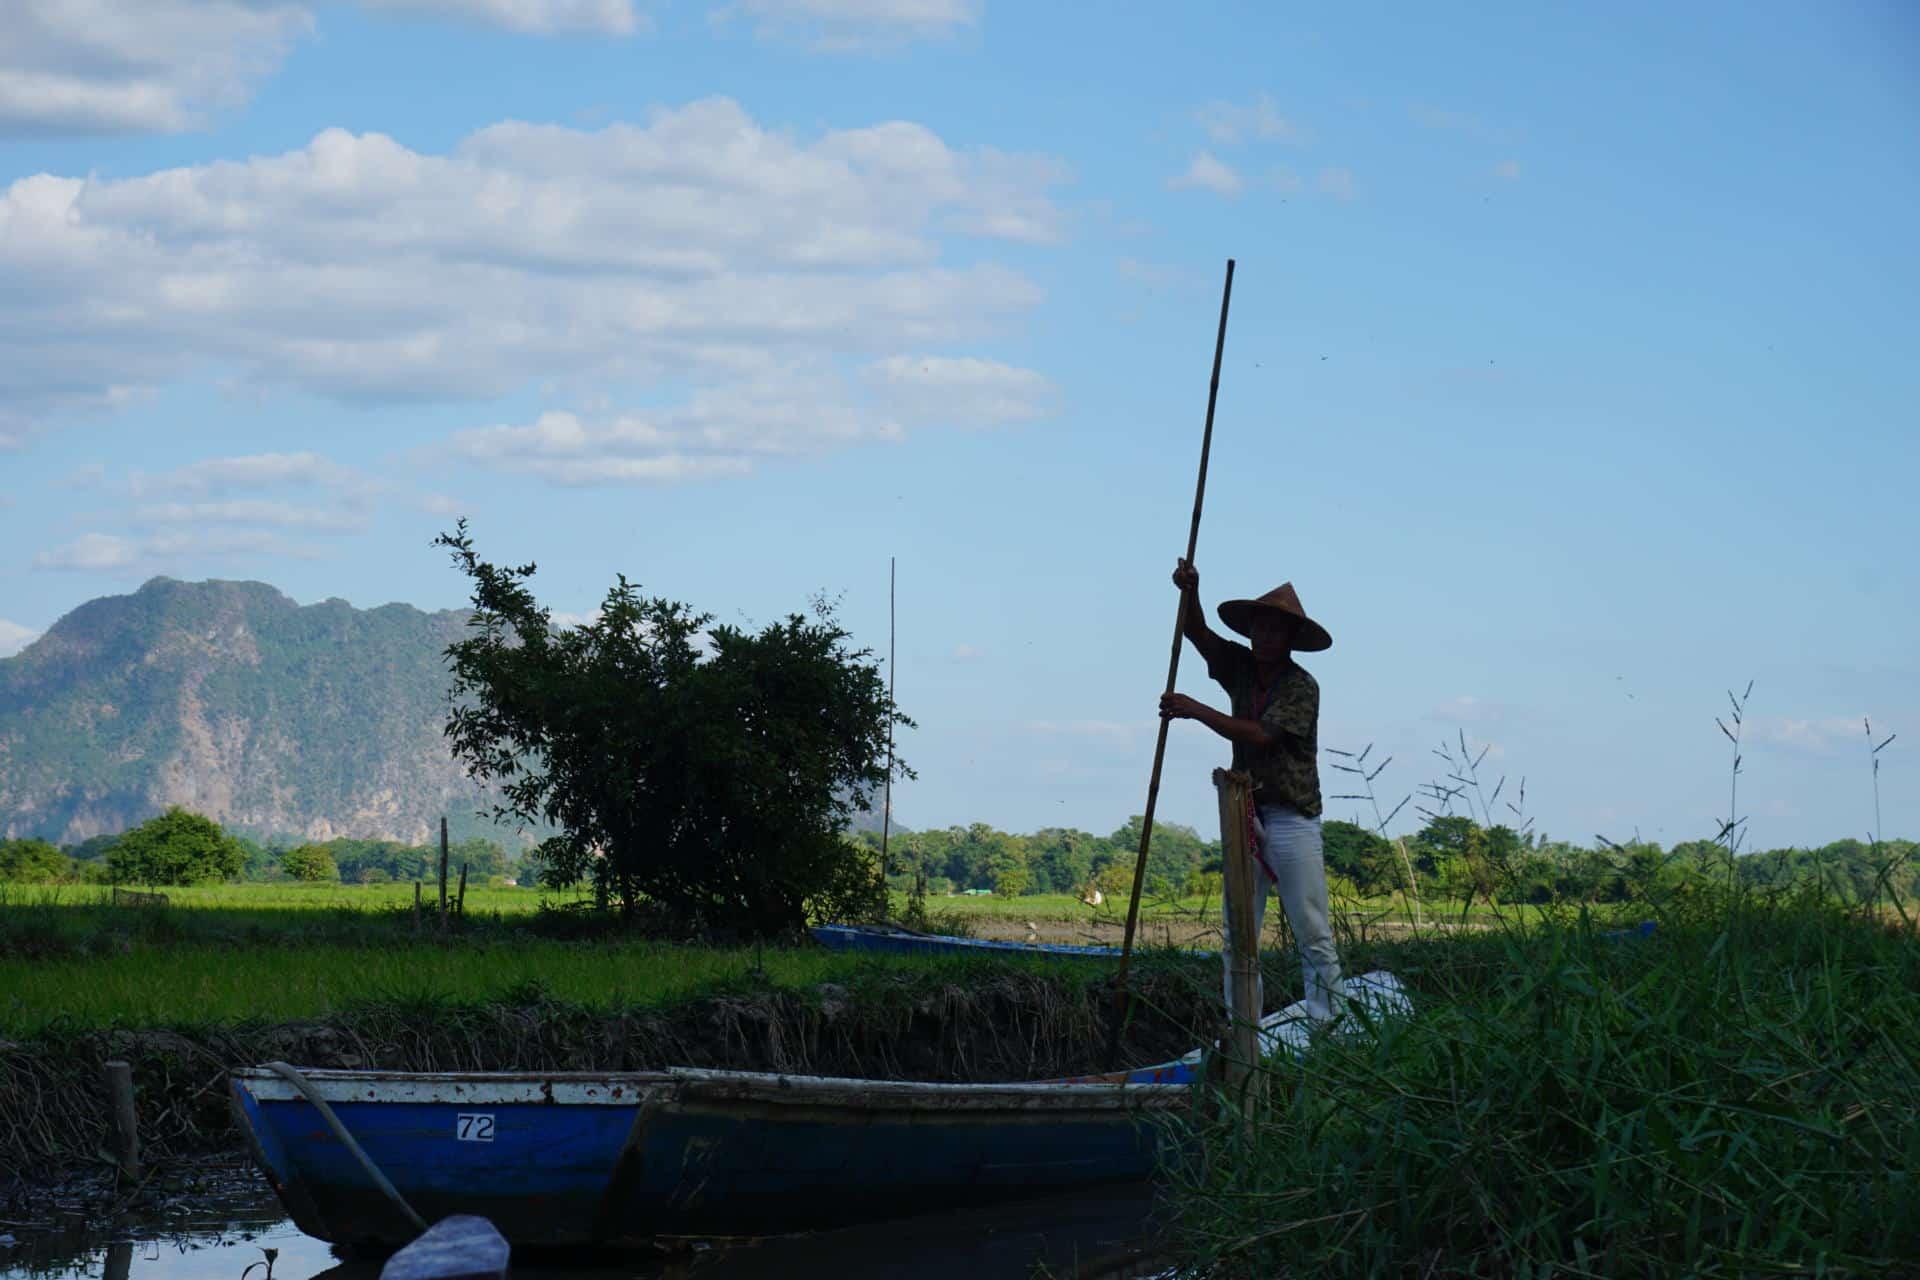 Hpa-An Reisfelder